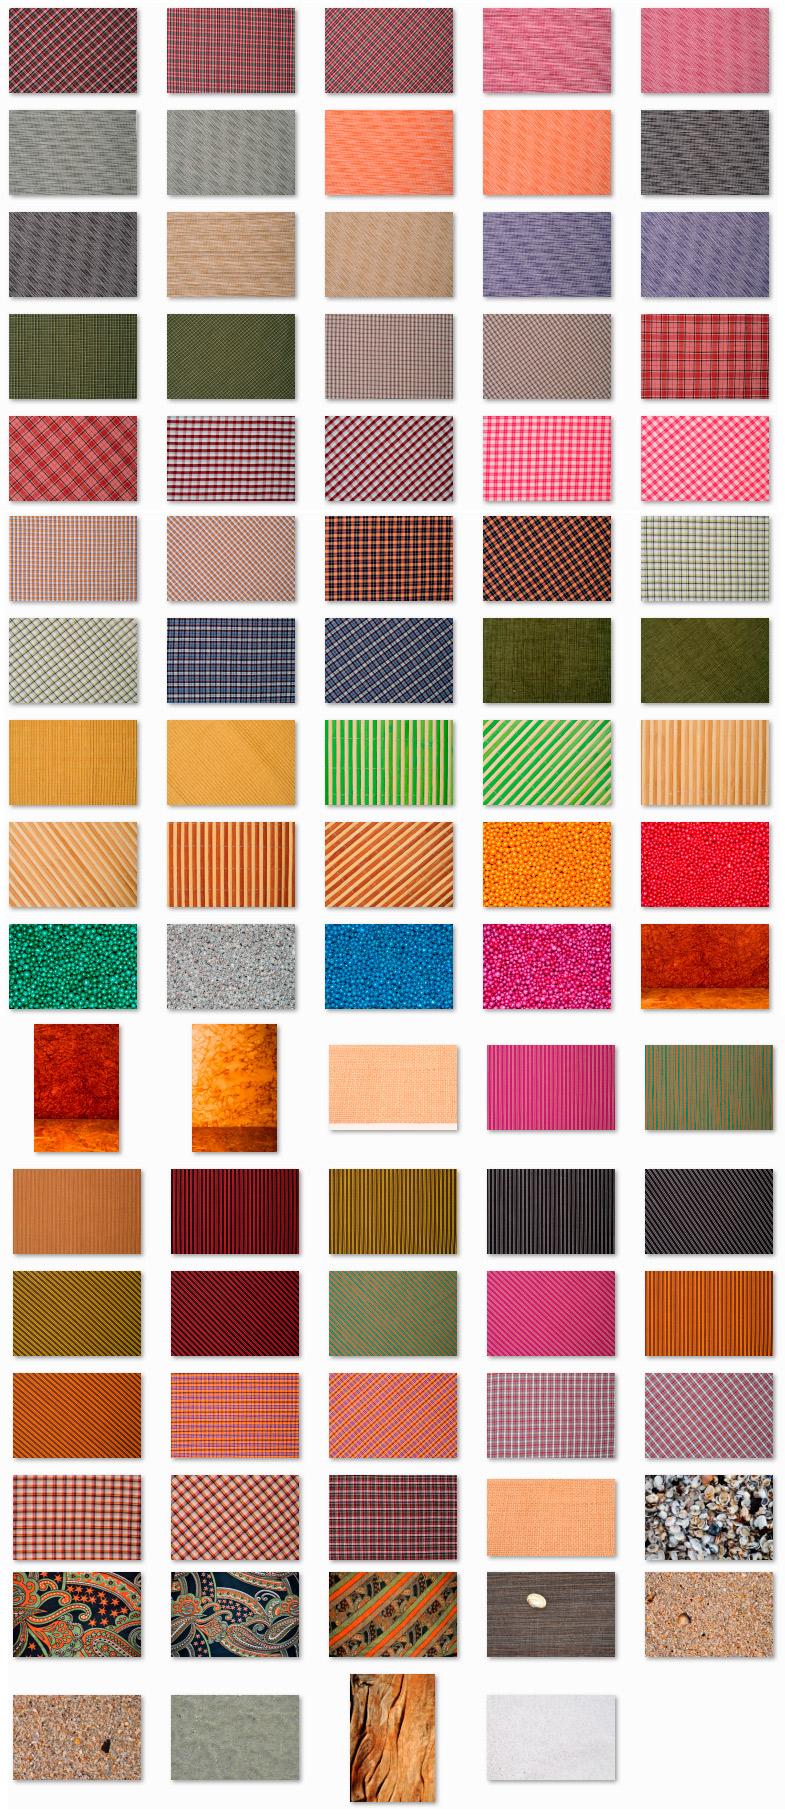 high quality stock photos - texture-imagine